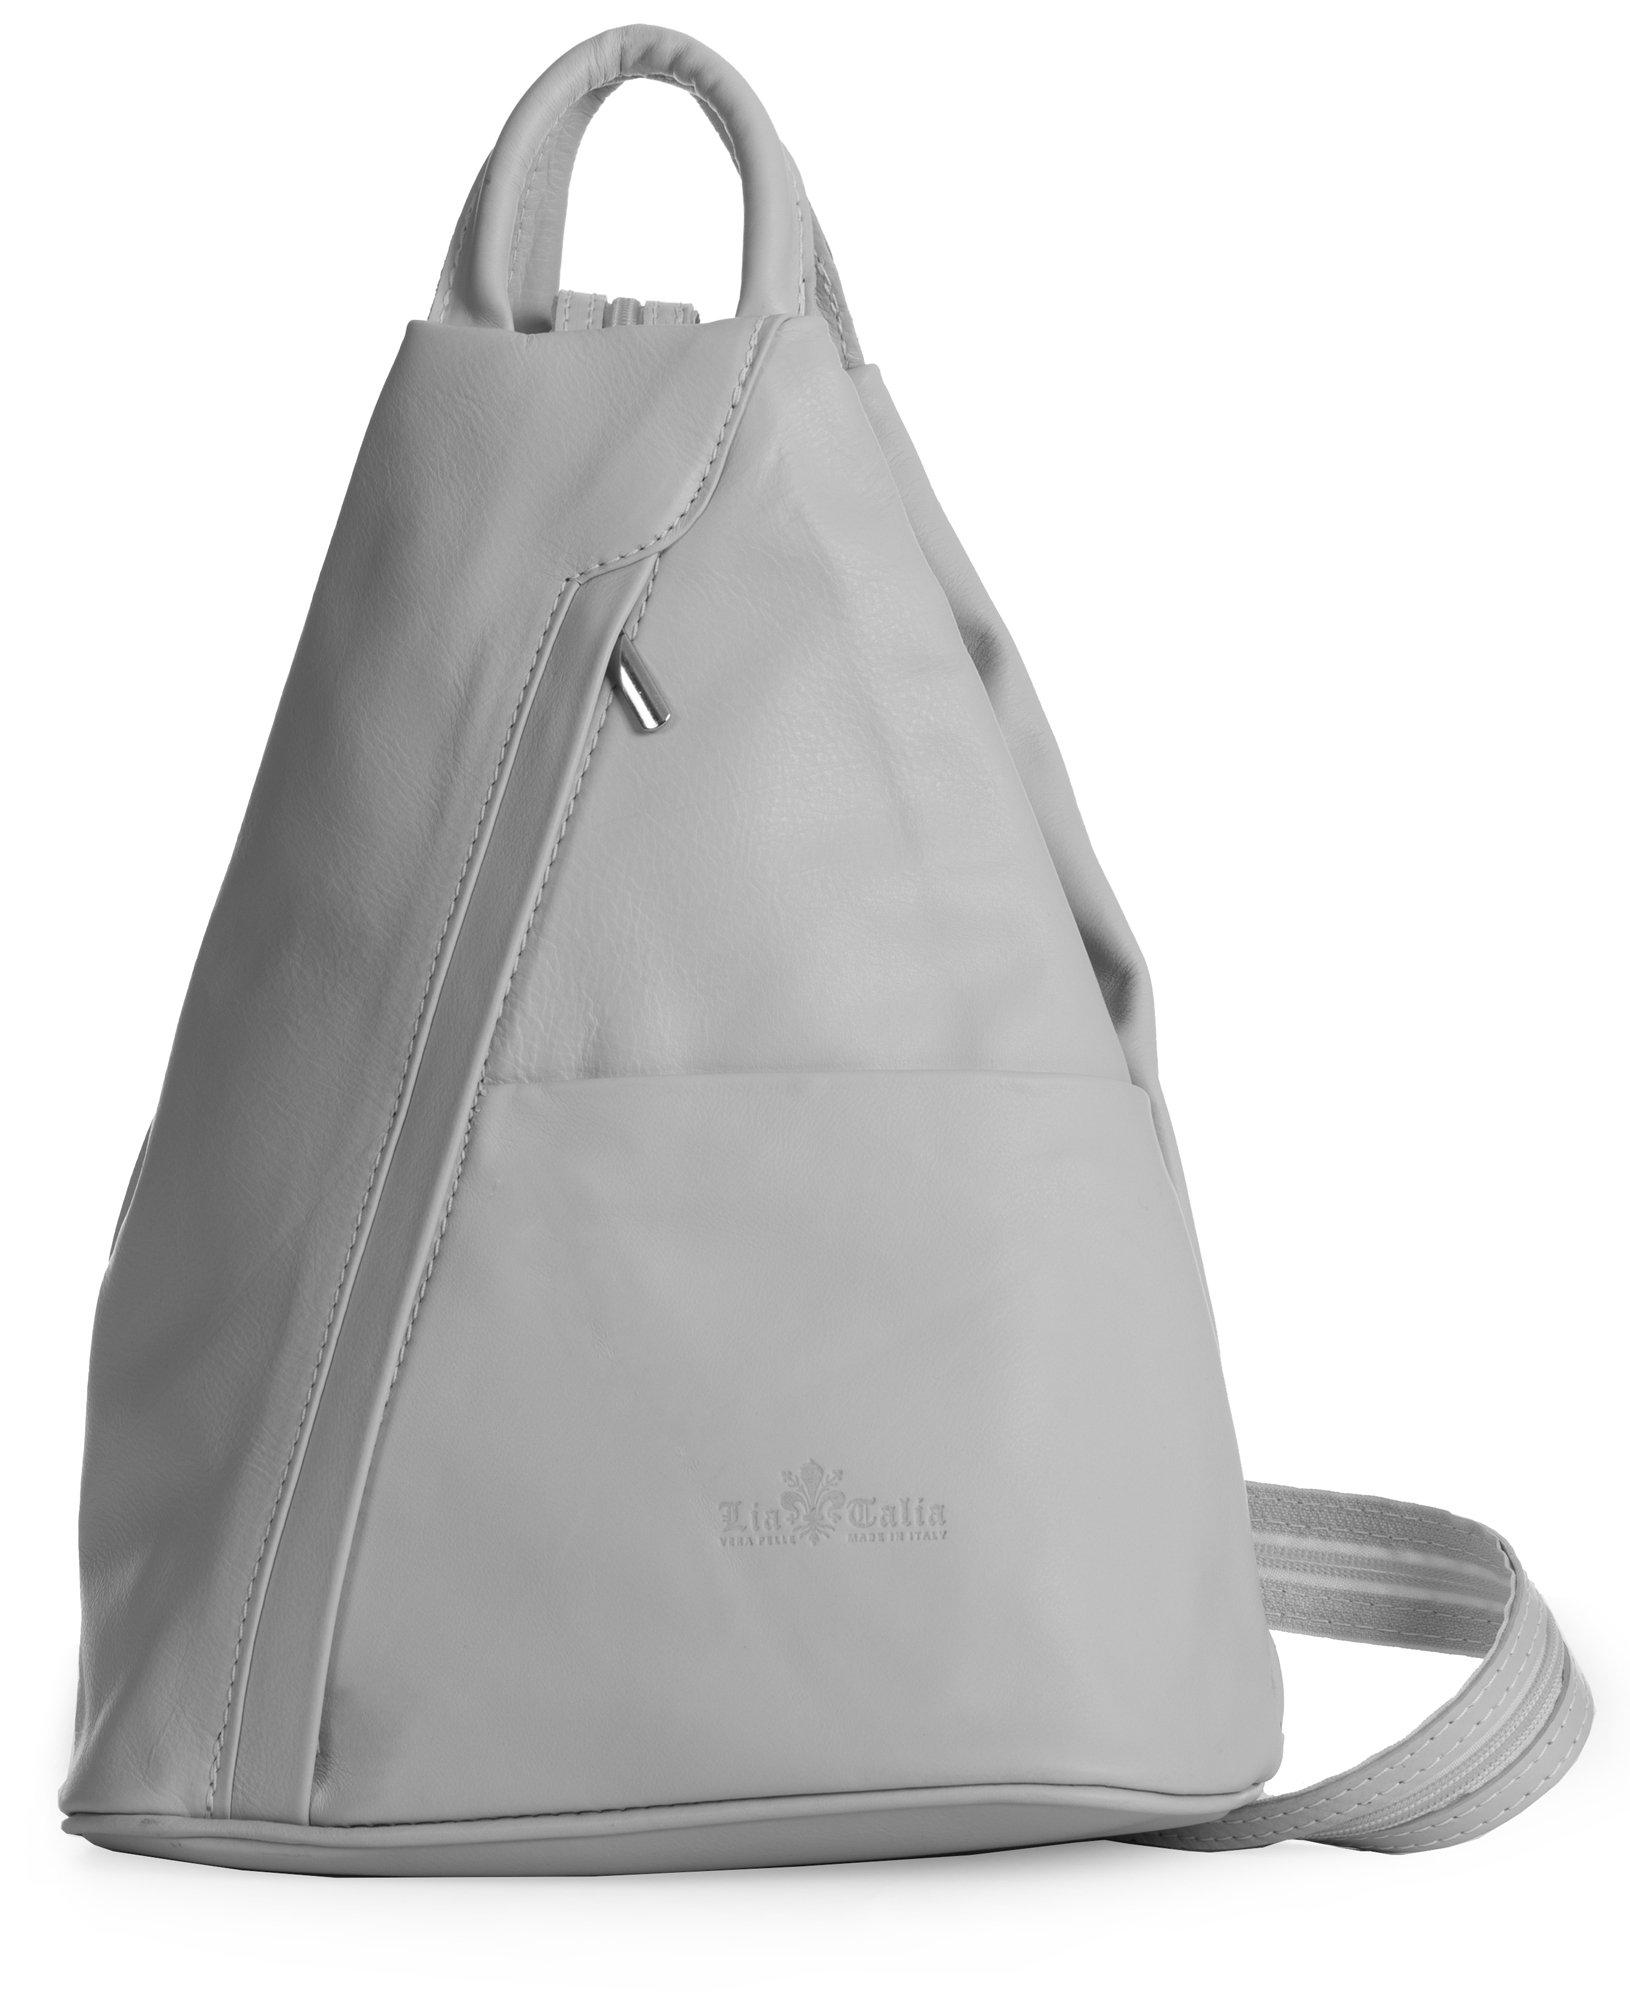 LiaTalia Unisex Soft Italian Leather Convertible Strap Small Backpack Rucksack Duffle Bag - Alex [Light Grey]